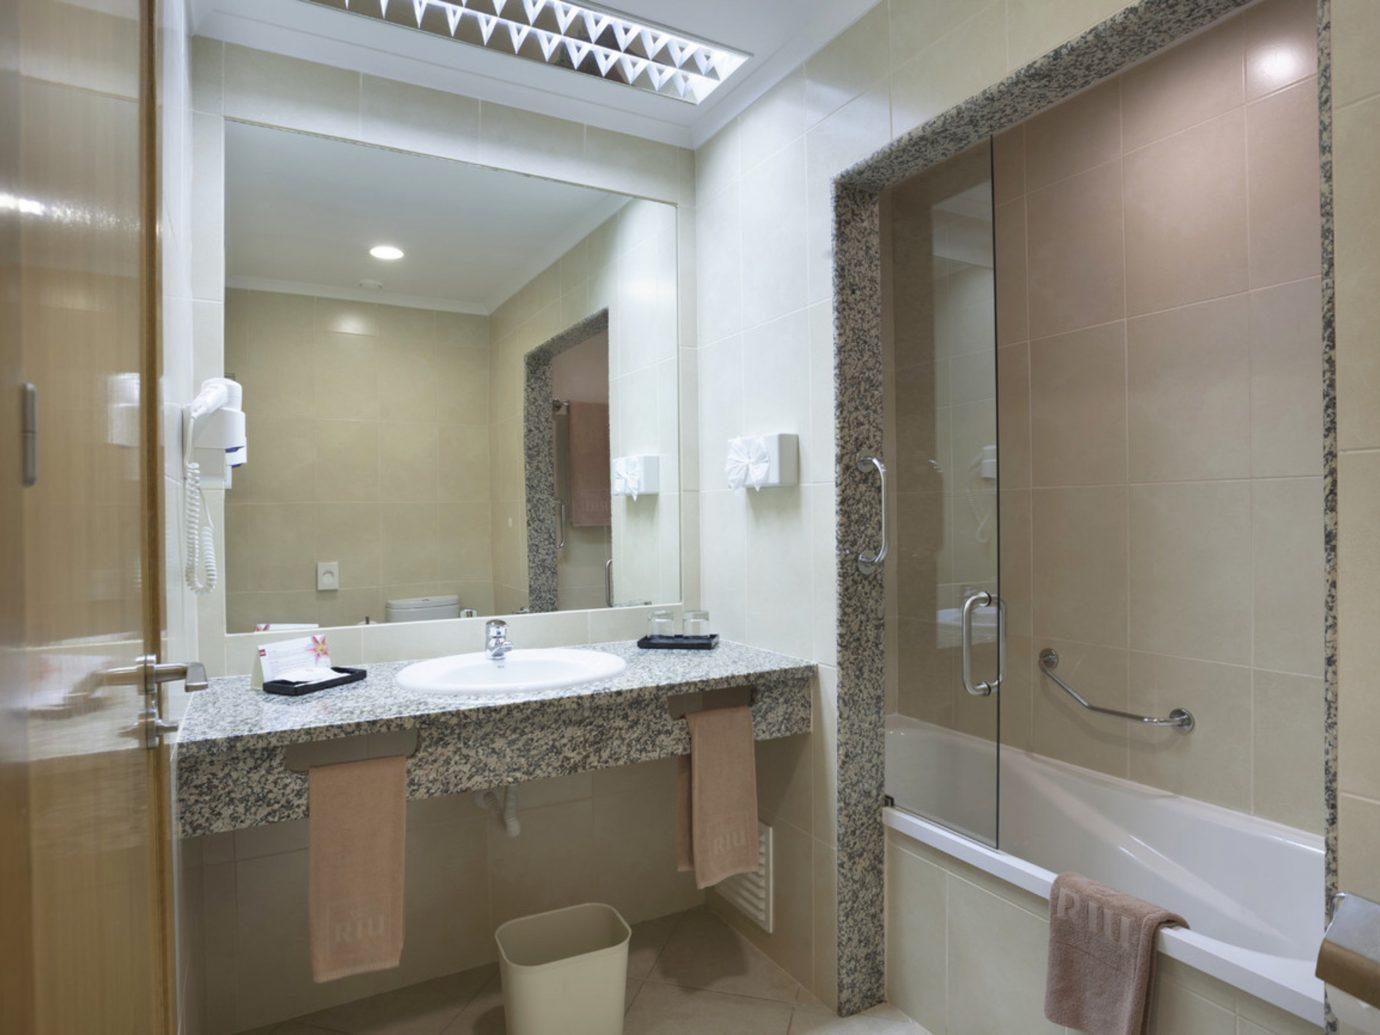 All-Inclusive Resorts Hotels bathroom wall indoor mirror room property sink interior design Suite real estate toilet estate home window tub tile tan bathtub Bath